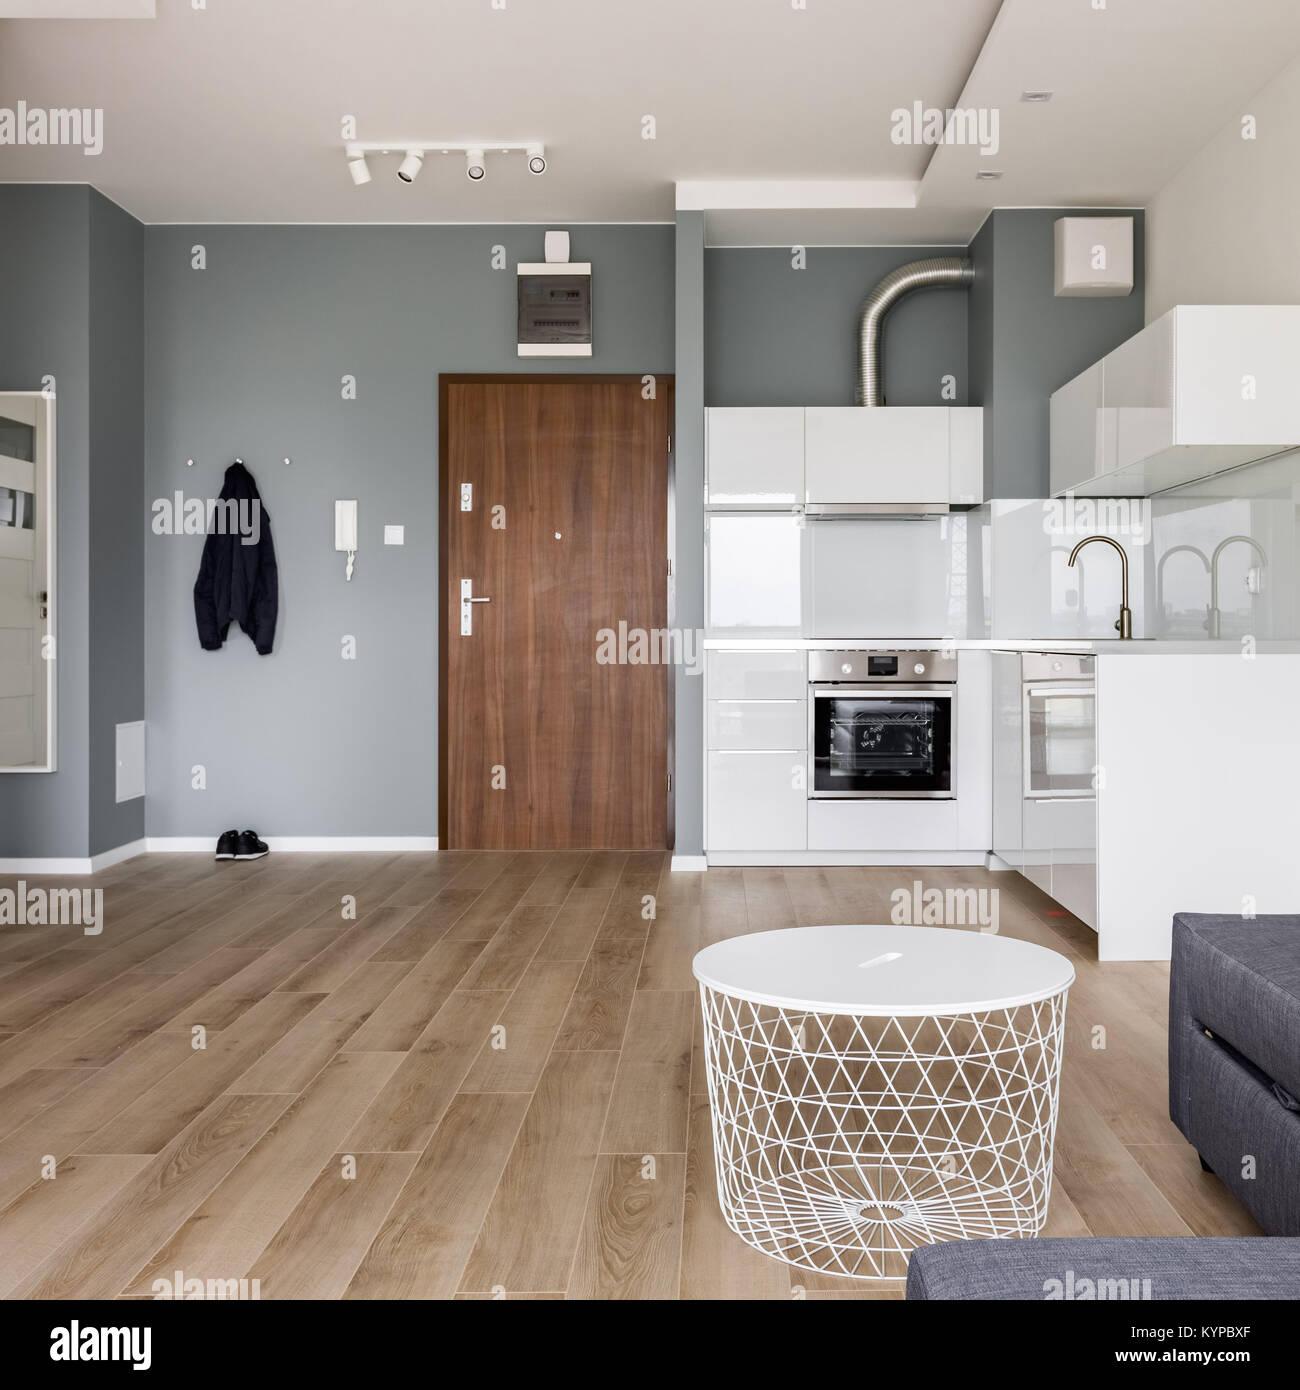 Studio moderno appartamento con piccola cucina bianca, corridoio e ...